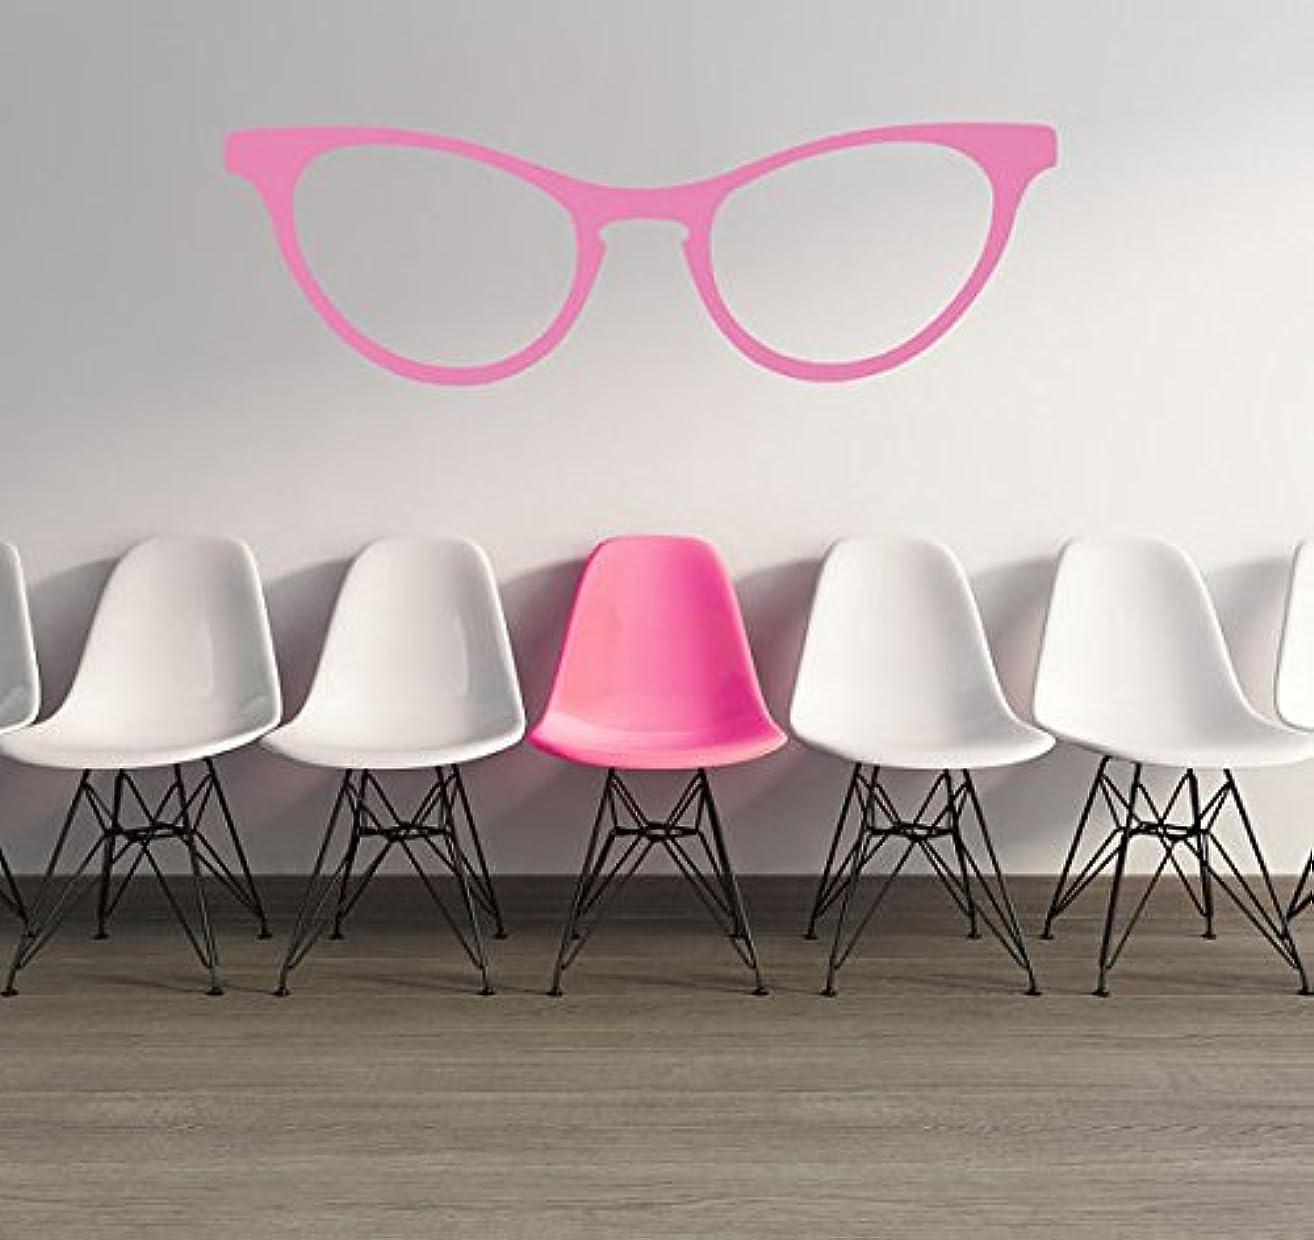 Glasses Wall Decal, Retro Glasses Wall Decal, Cat Eye Glasses, Optometrist Wall Decor, Dorm Decor, Fashion Trendy Eyewear, Specs Sunglasses